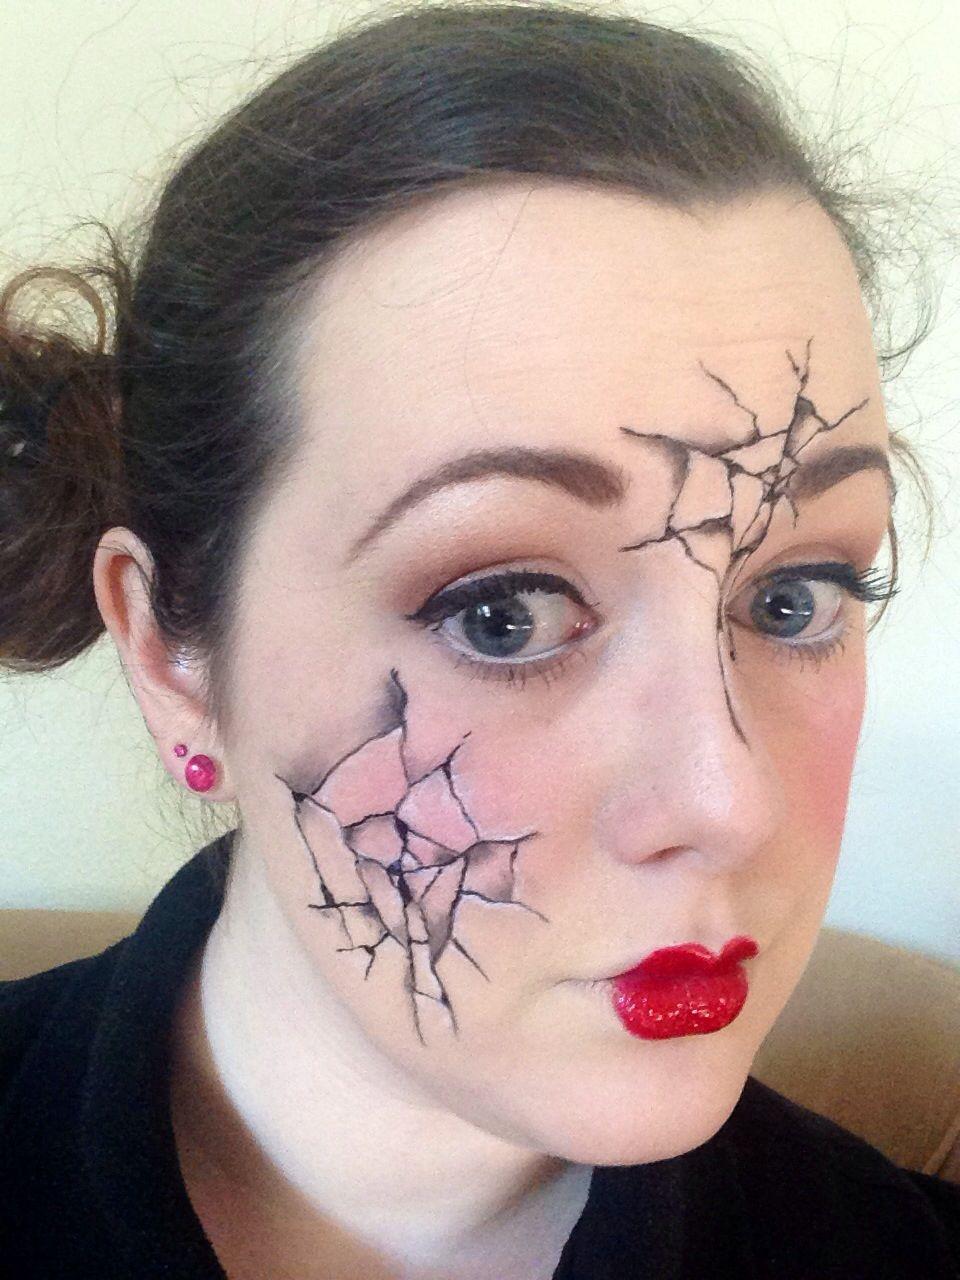 Cracked Face Halloween Makeup Unique Halloween Makeup Cool